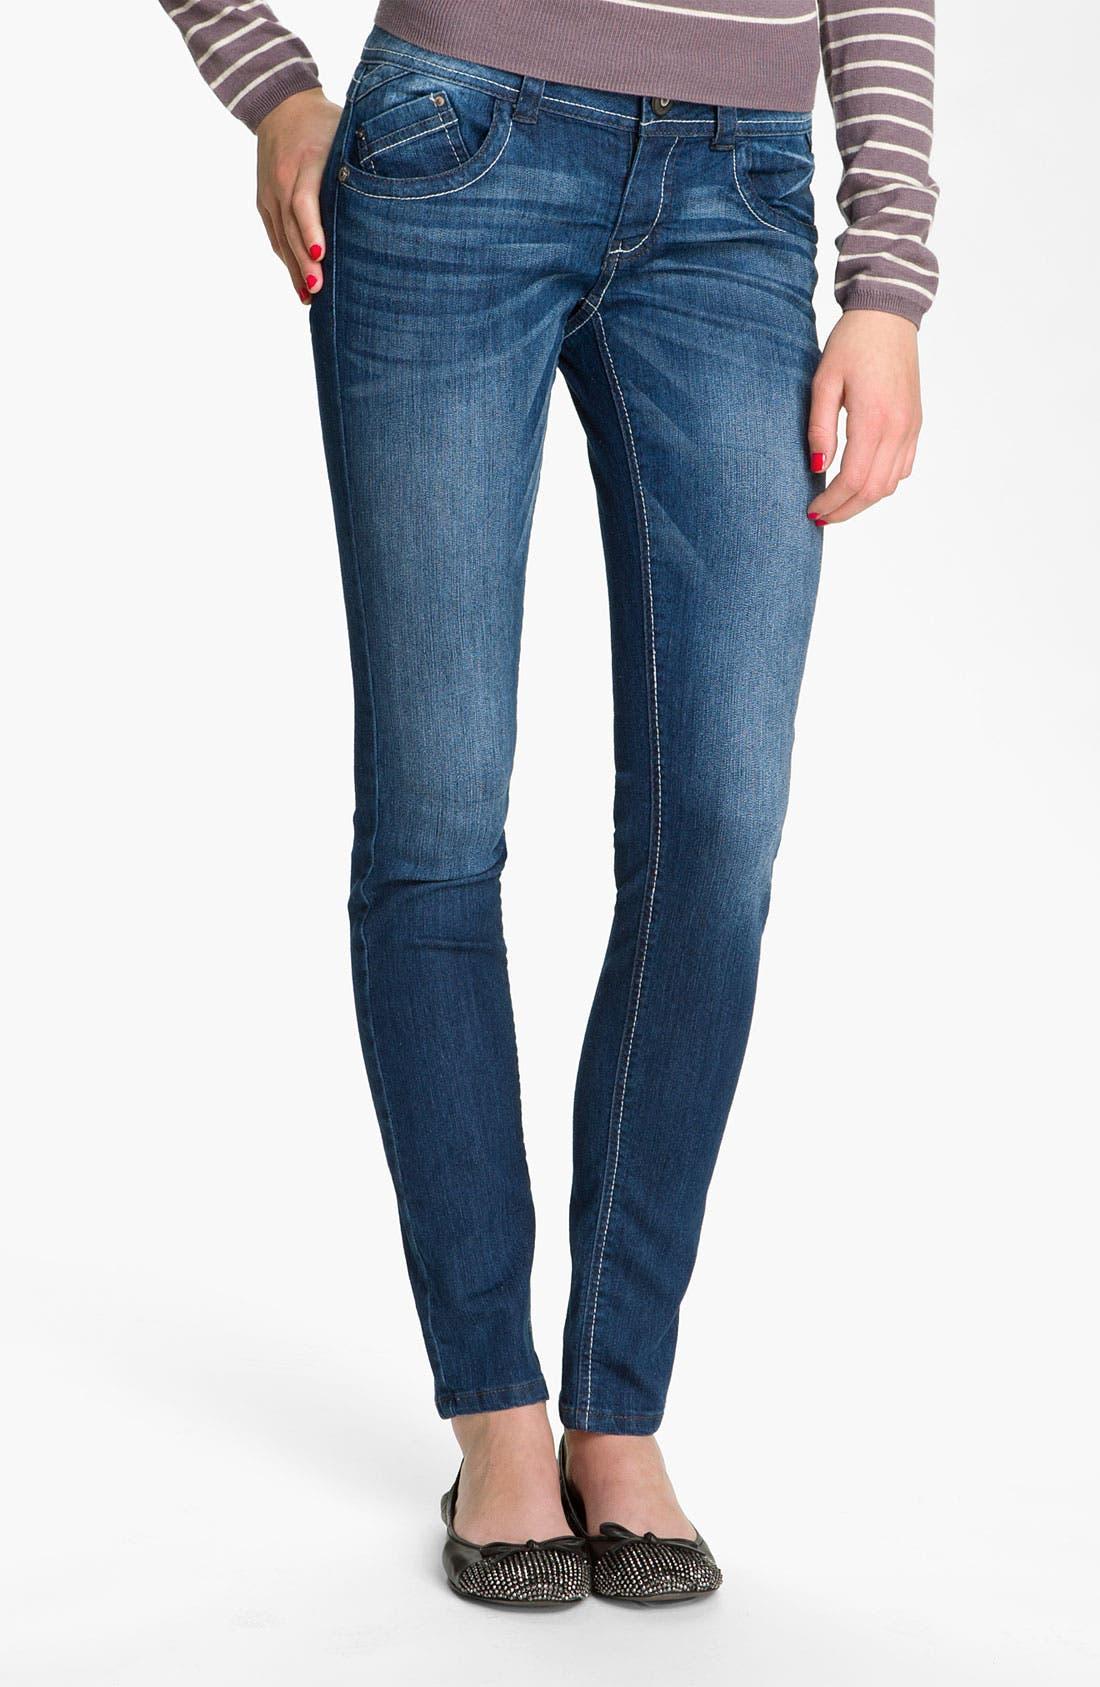 Main Image - Jolt 'J' Pocket Skinny Jeans (Juniors)